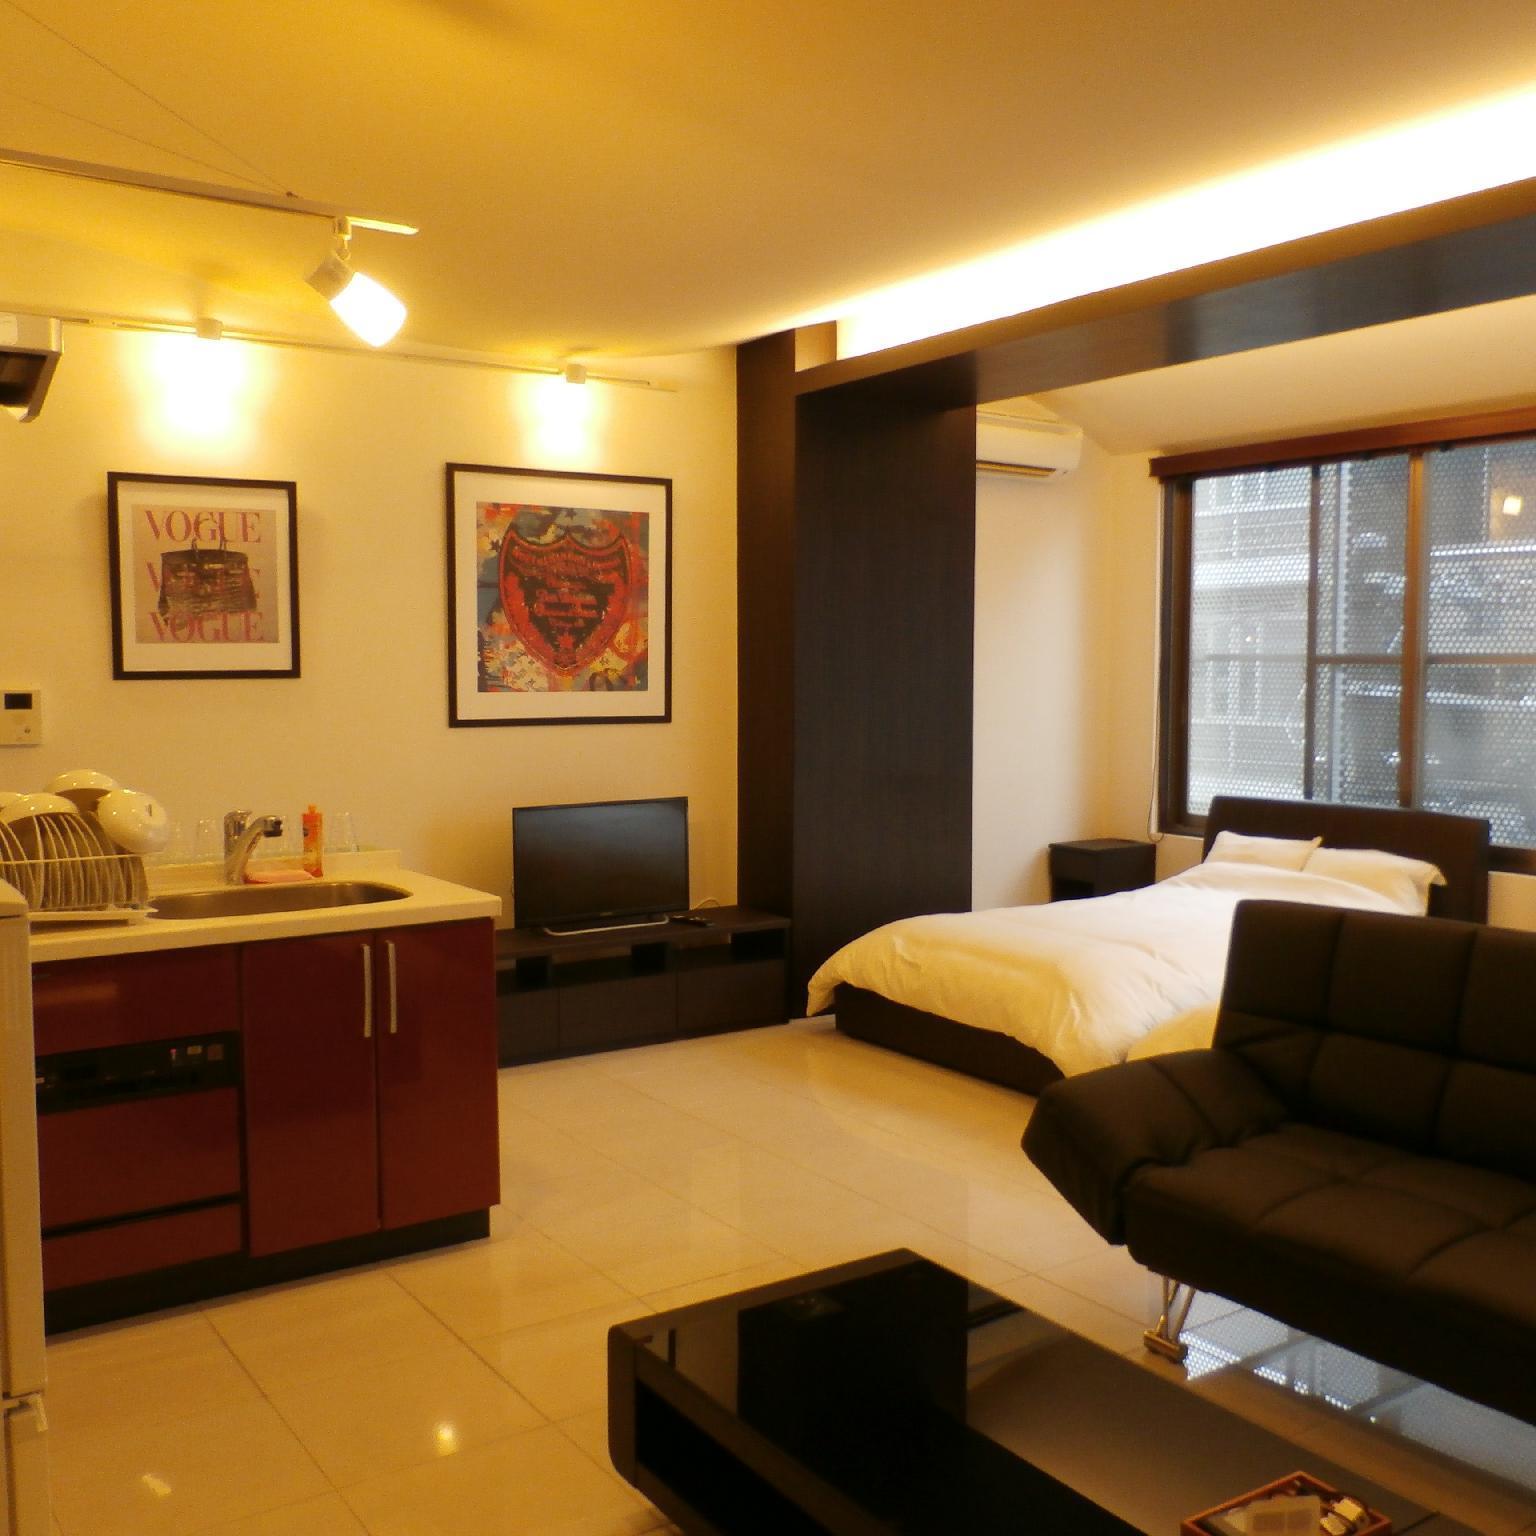 401room(75m)LUXURIA SHINSAIBASI Special Room!